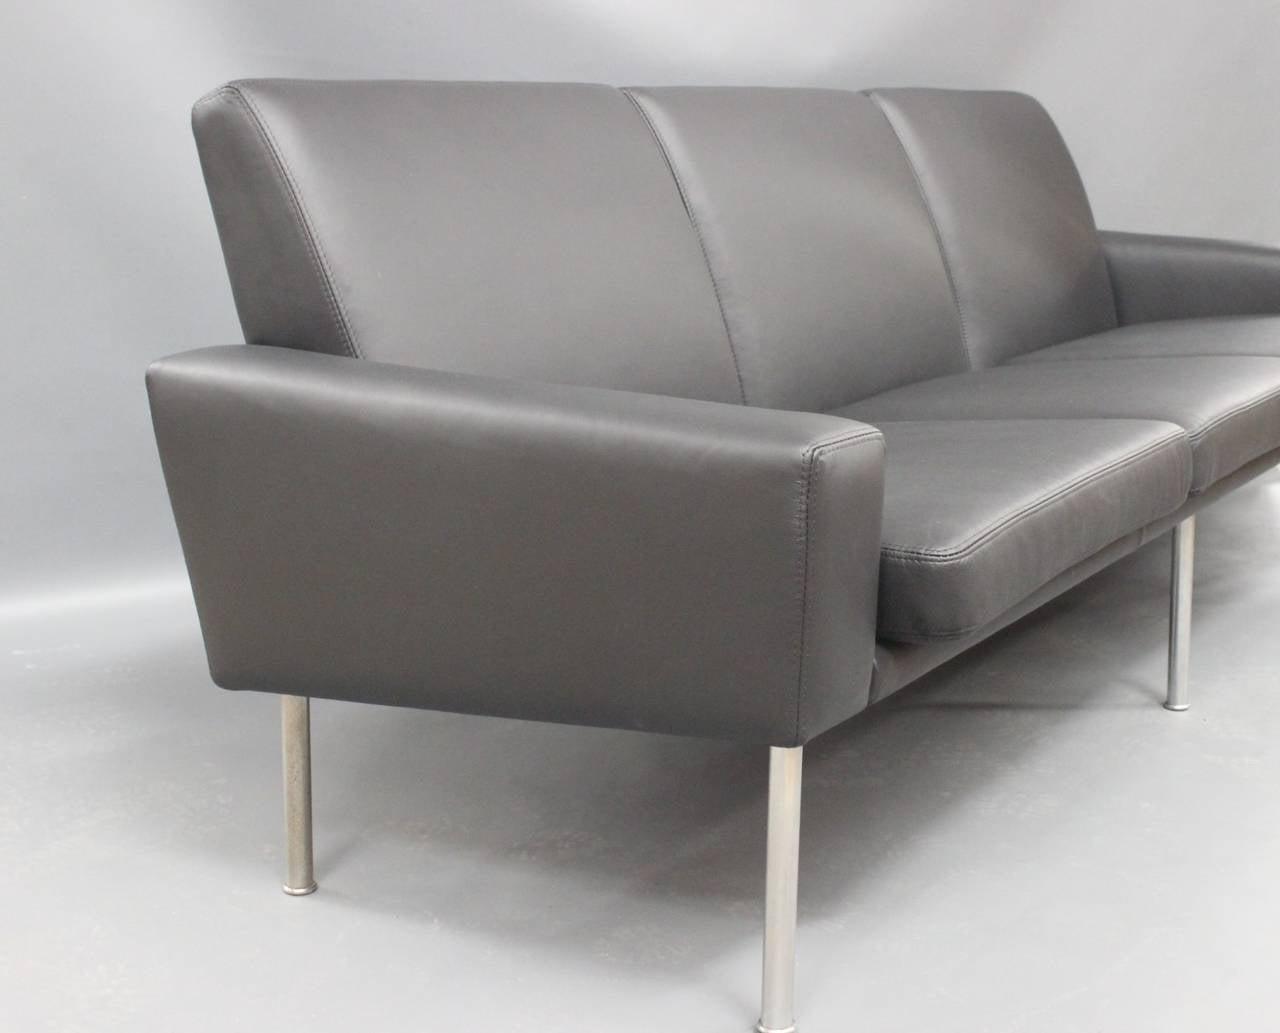 Scandinavian Modern Three-Seat Sofa, Model 34/3, by Hans J. Wegner in Black Savanne Leather, 1960 For Sale